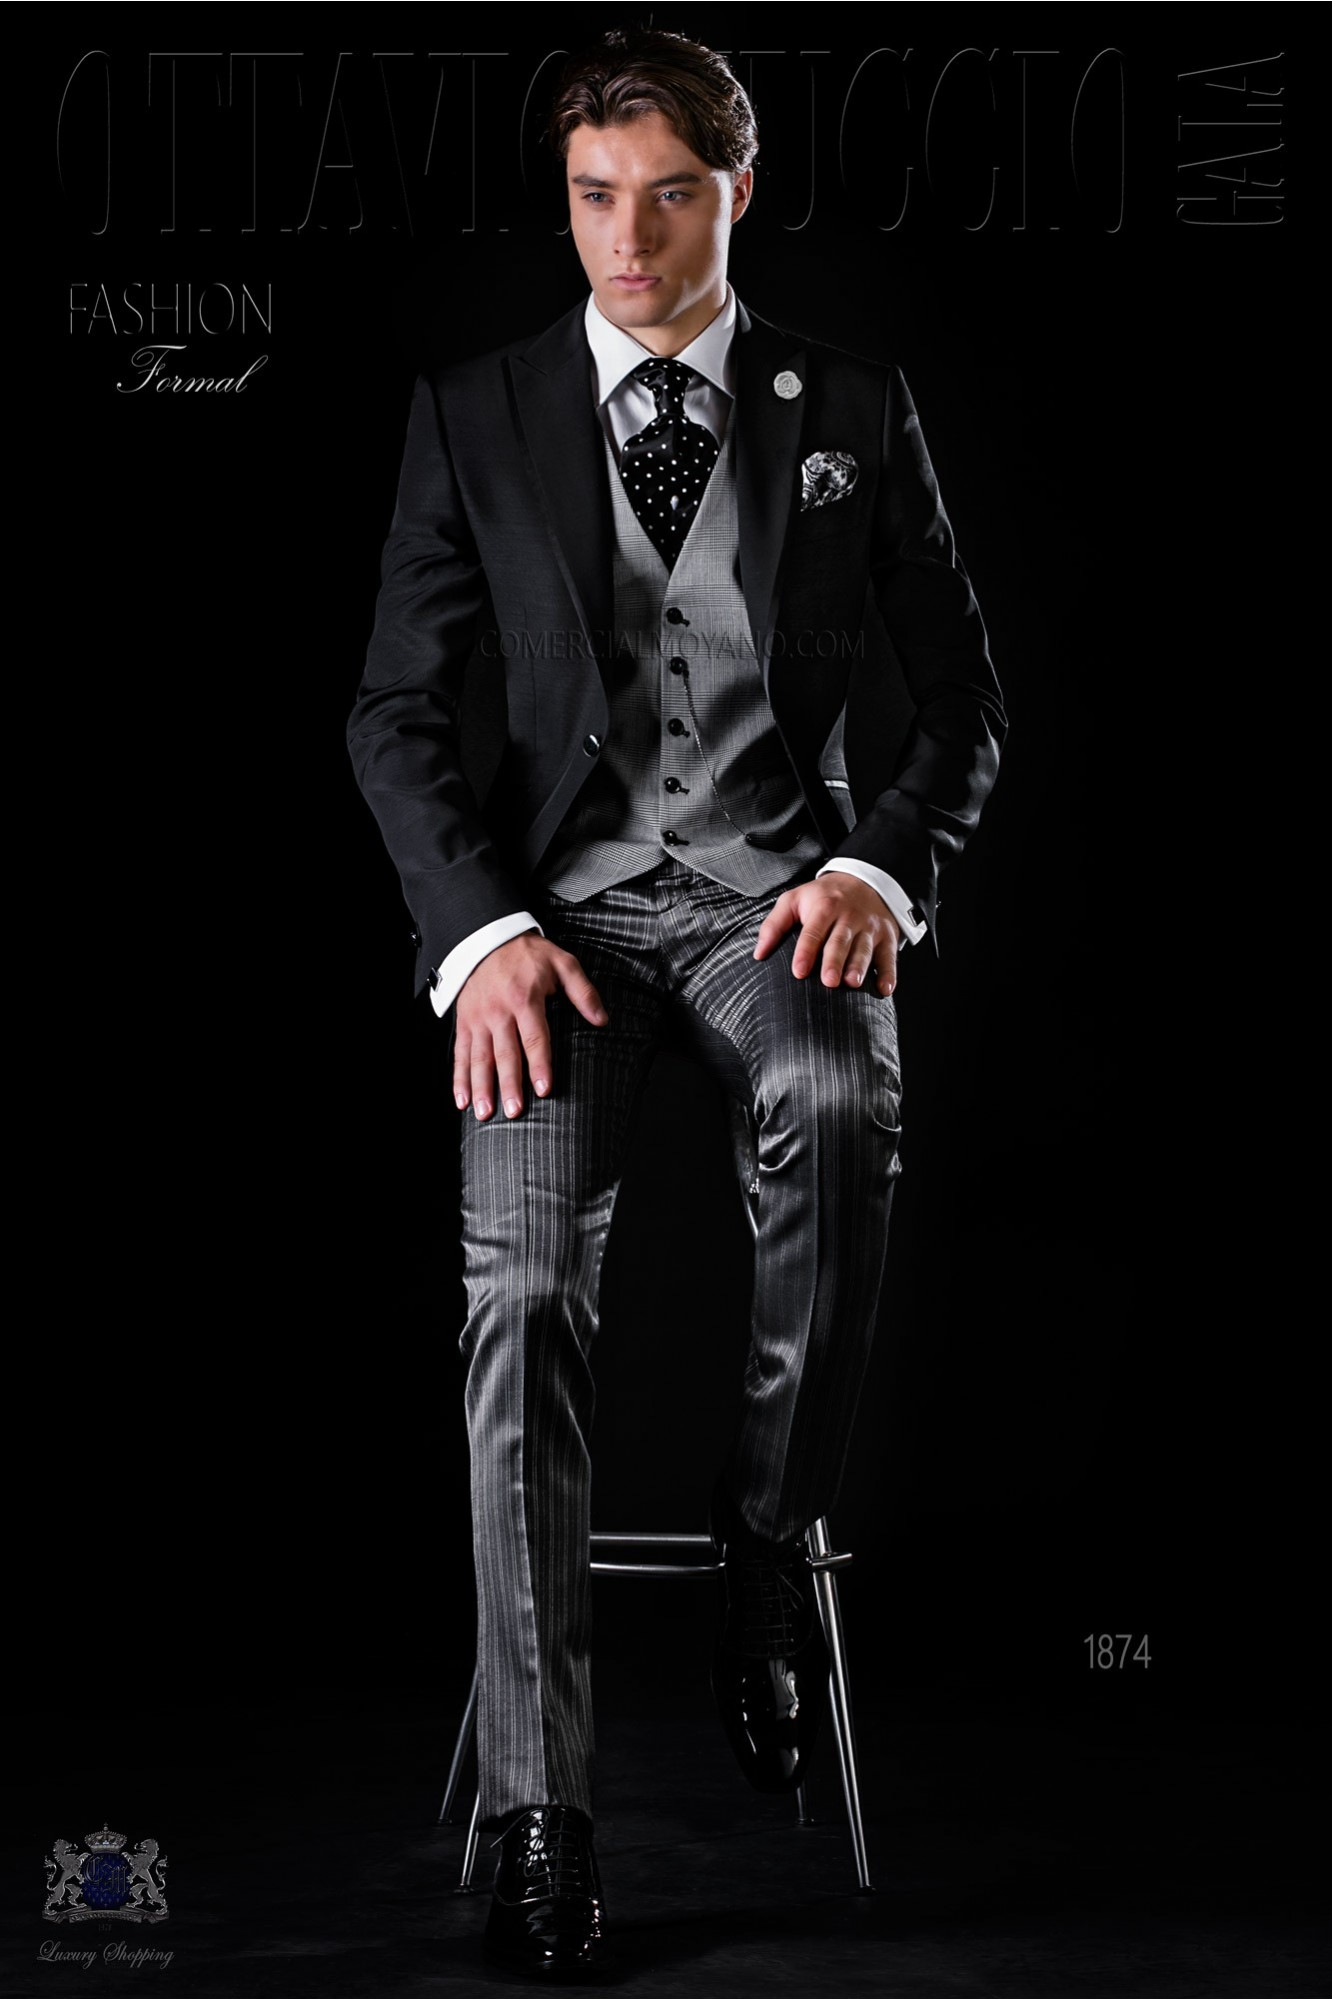 Traje de novio chaqueta negra con pantalón media etiqueta modelo: 1874 Ottavio Nuccio Gala colección Fashion